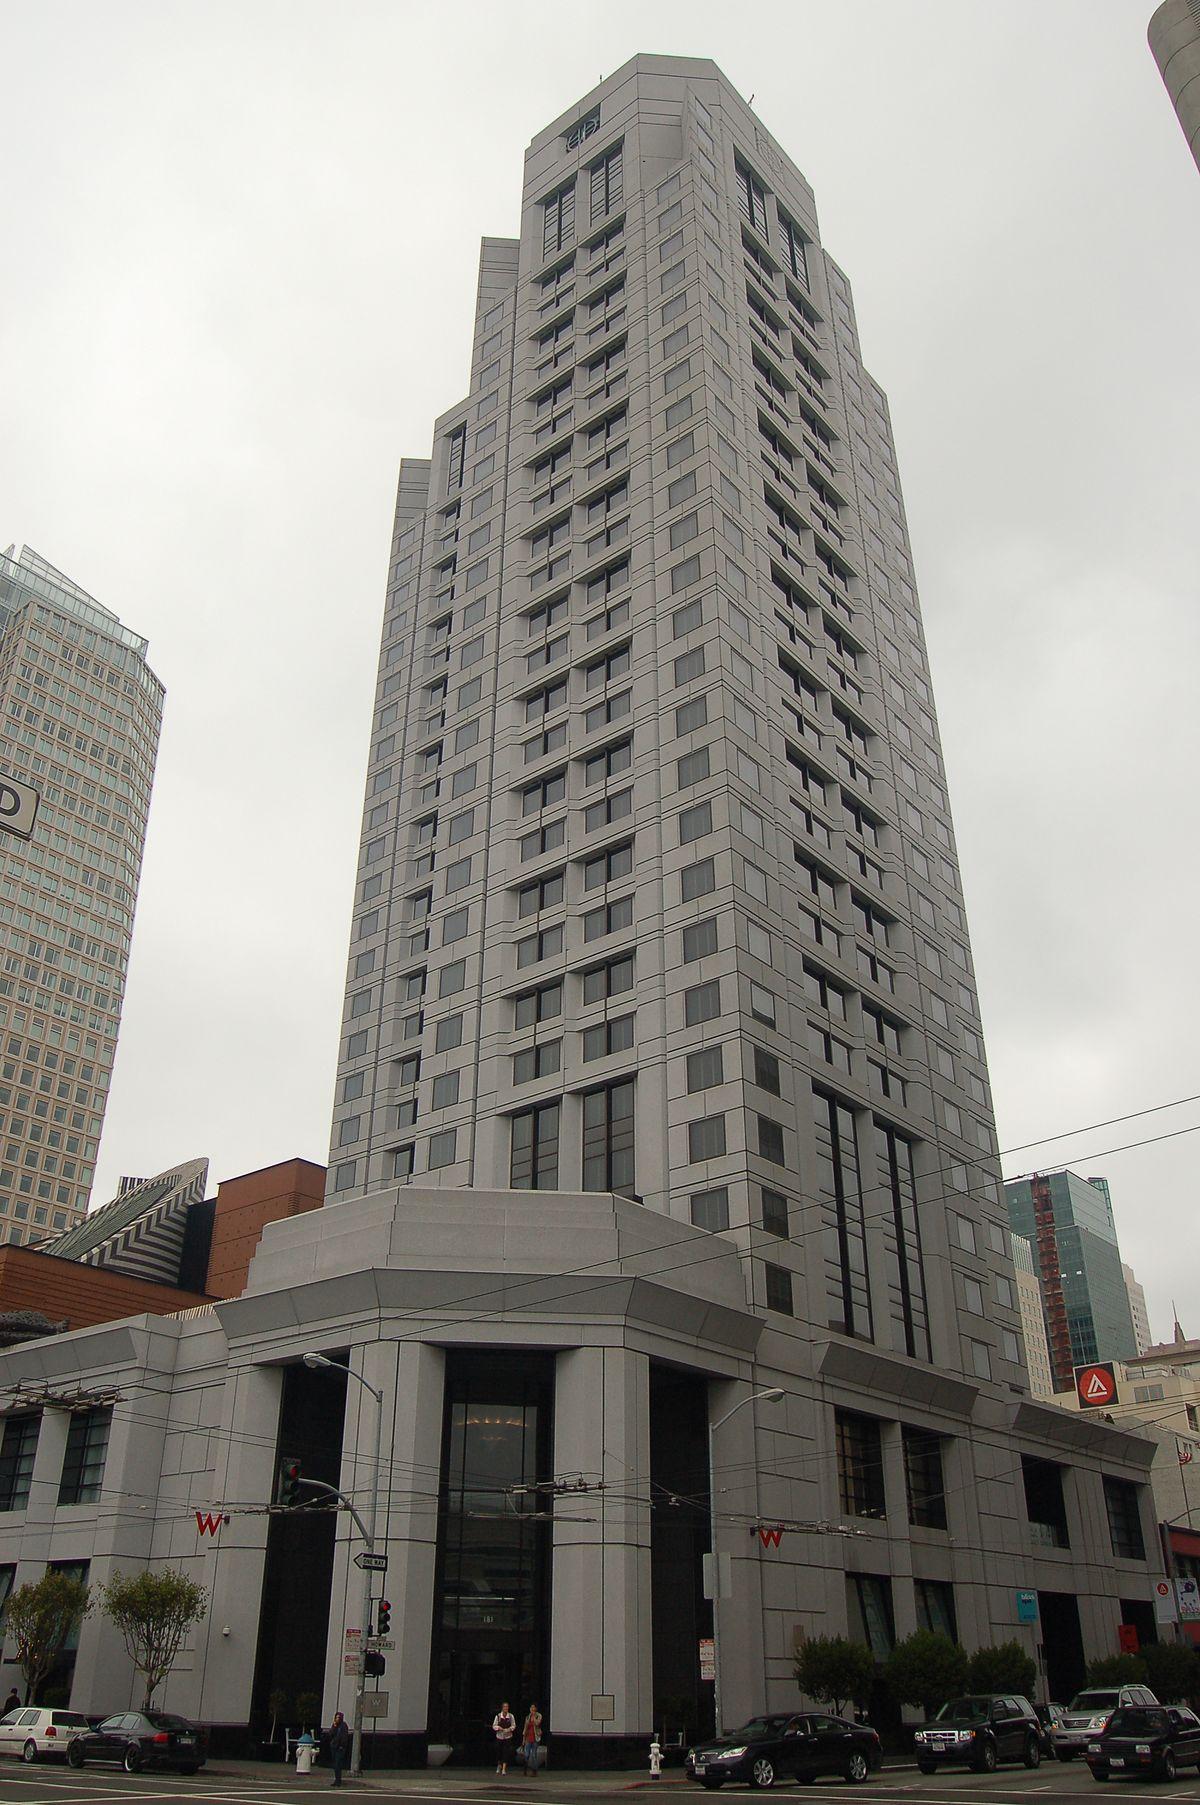 W San Francisco  Wikipedia